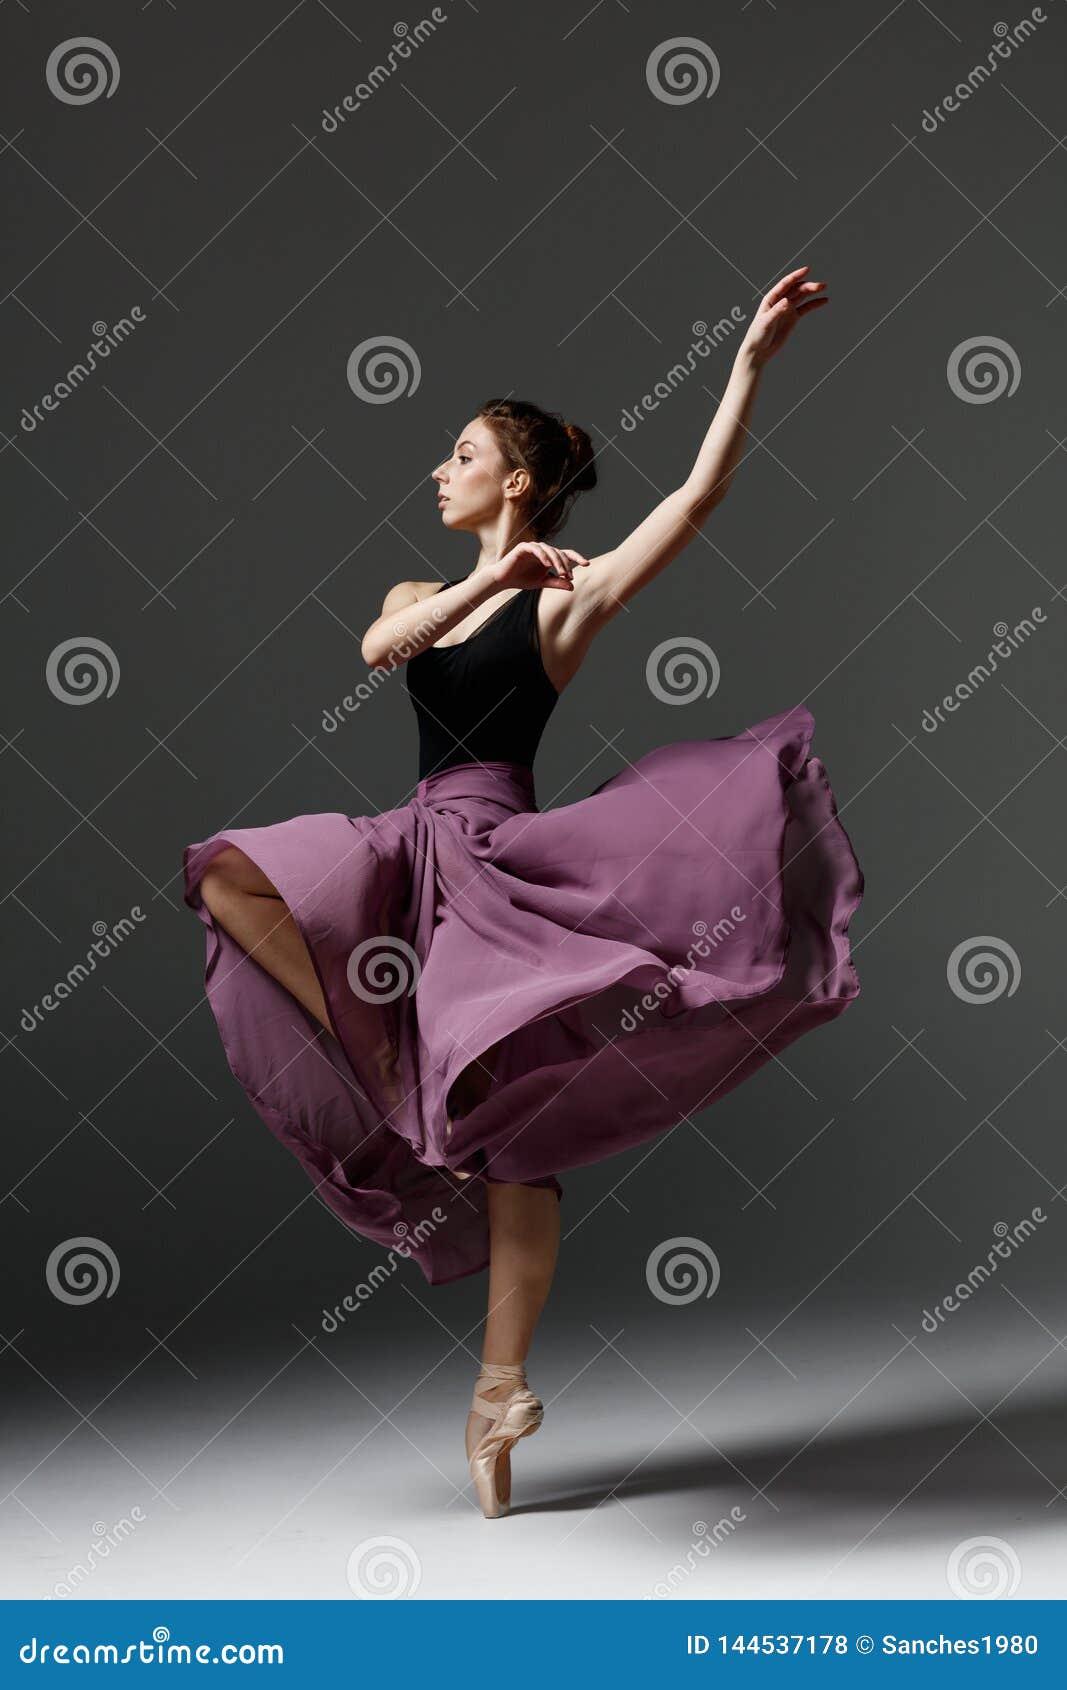 Young Beautiful Ballerina Is Posing In Studio Stock Photo Image Of Beauty Caucasian 144537178